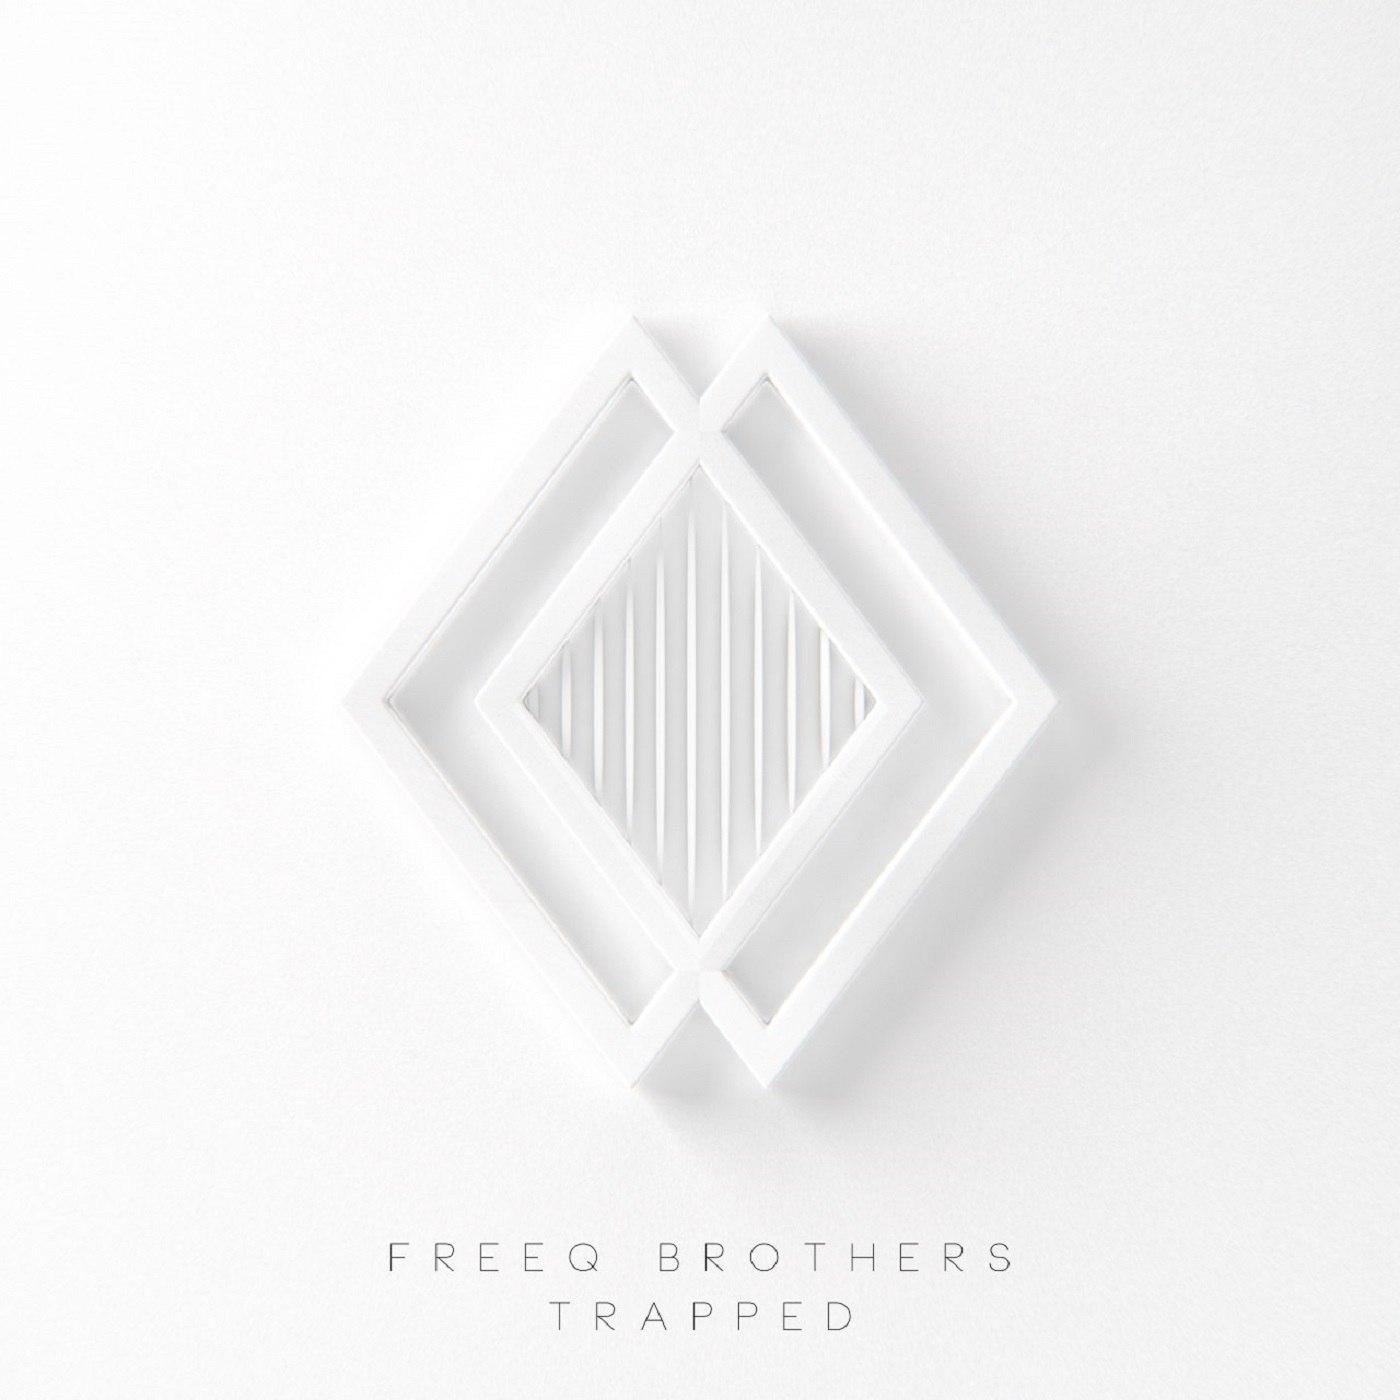 Новый сингл FreeQ Brothers–Trapped